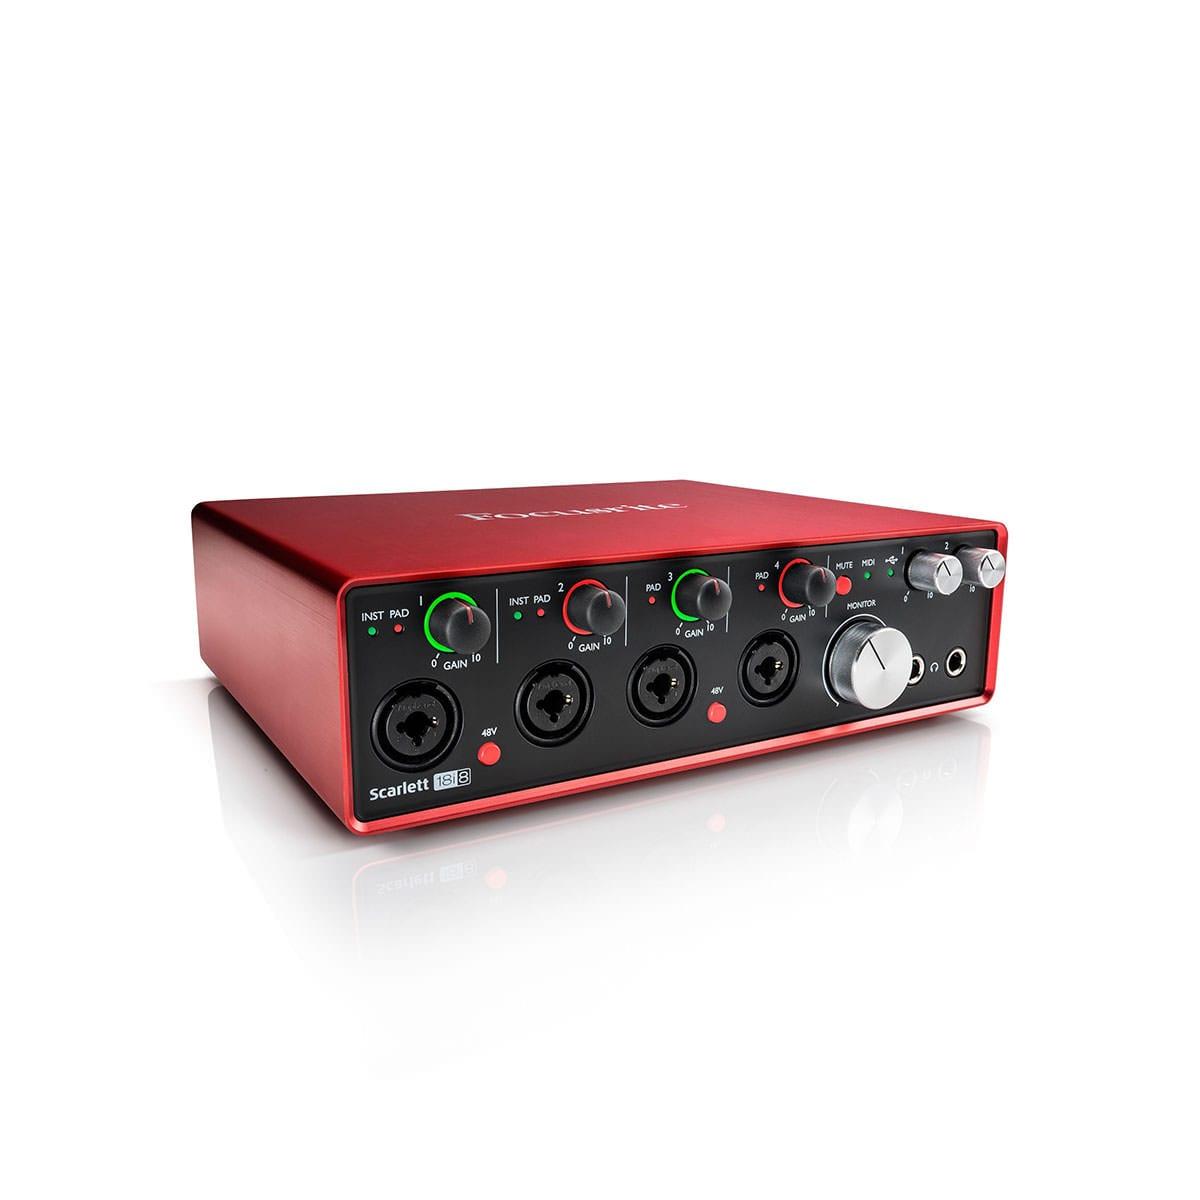 Scarlett 18i8 USB Audio Interface - 2nd Generation